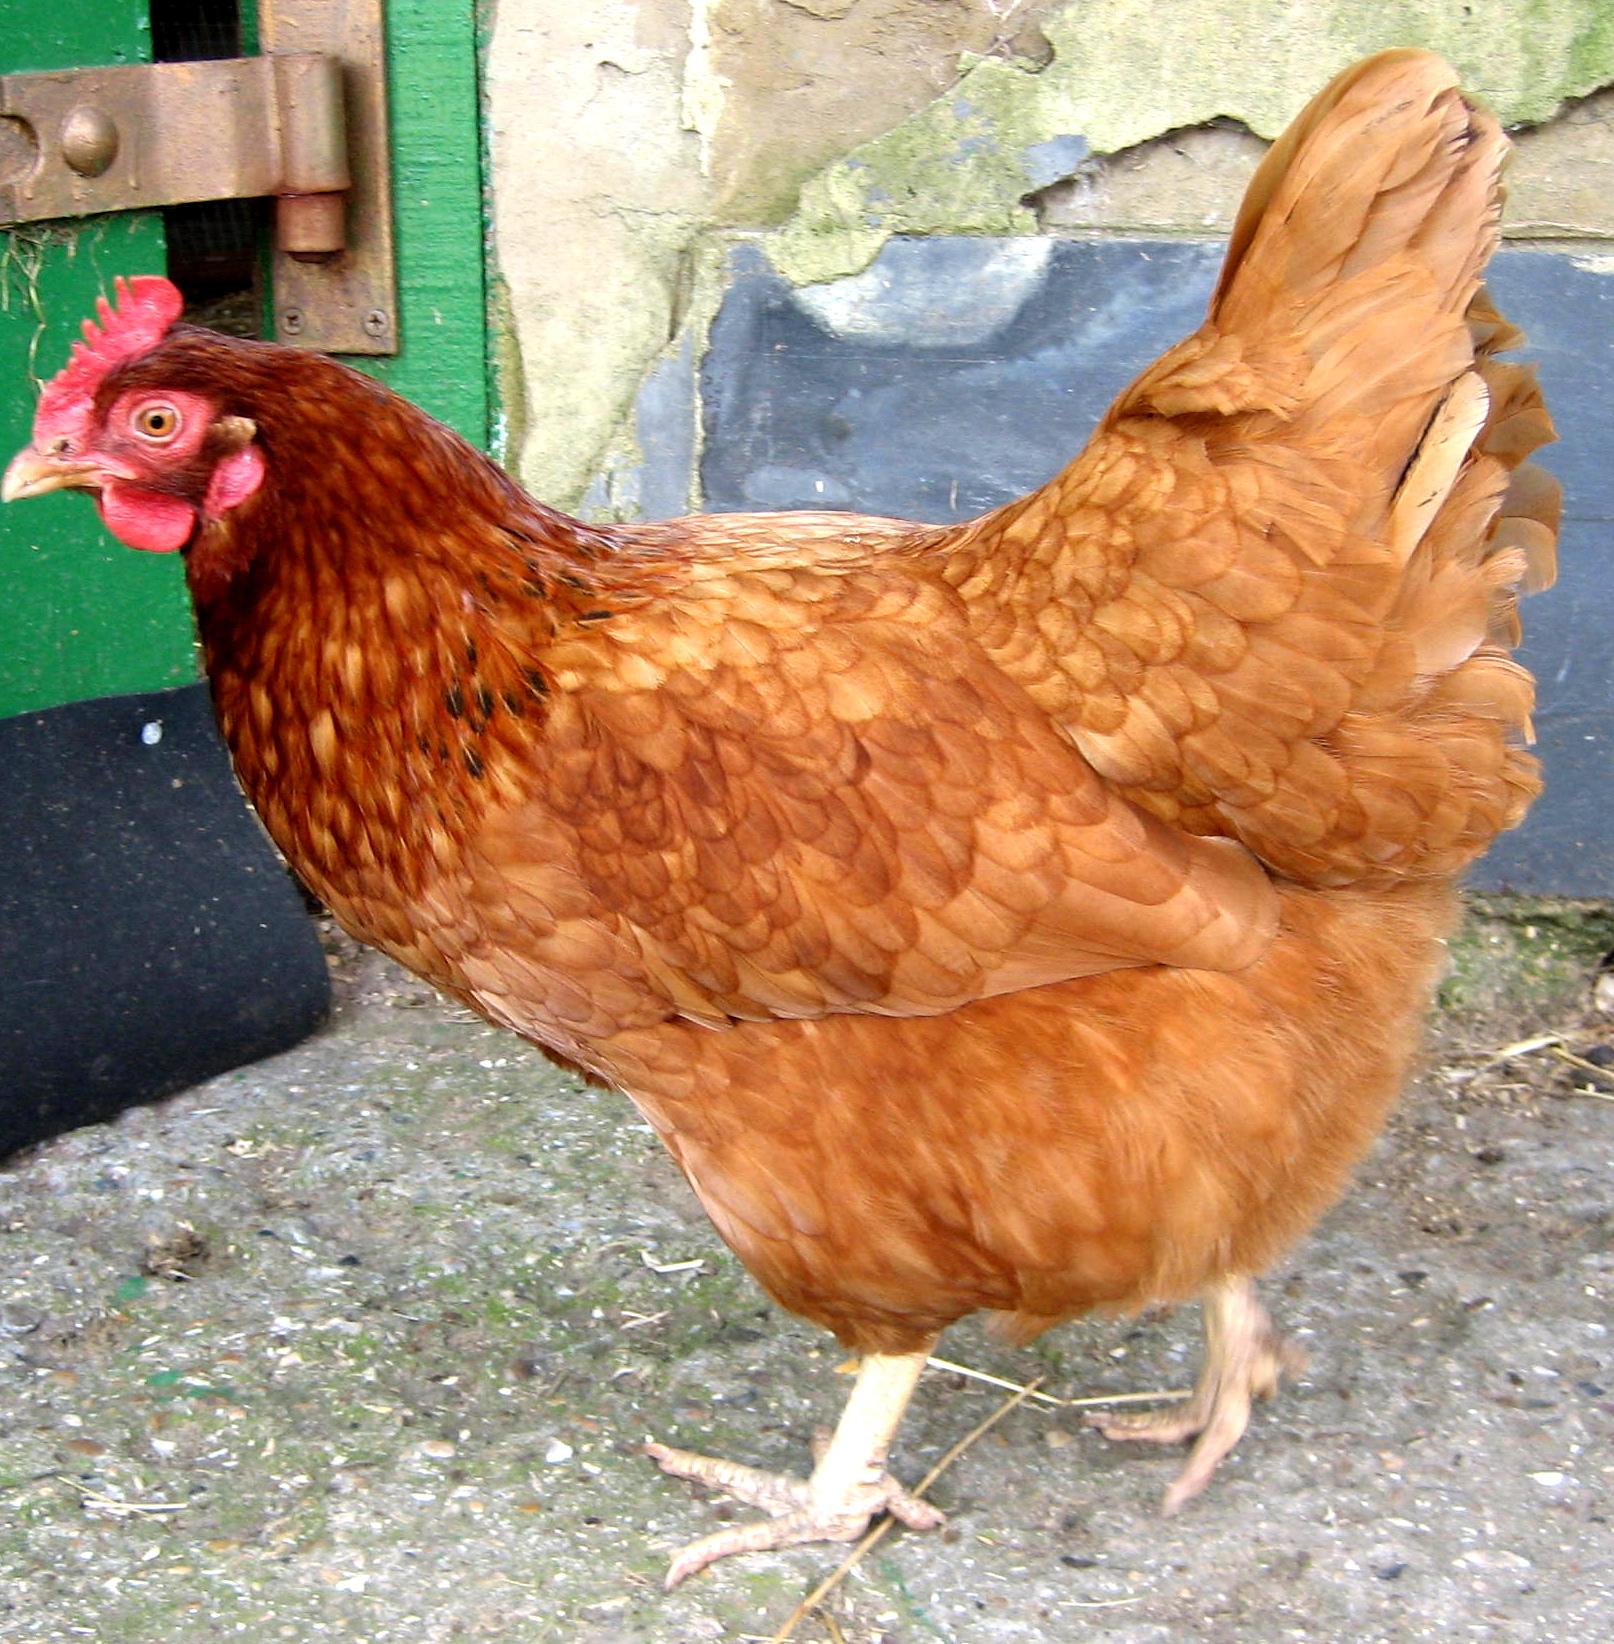 Spinach & Eggs From Spitalfields City Farm